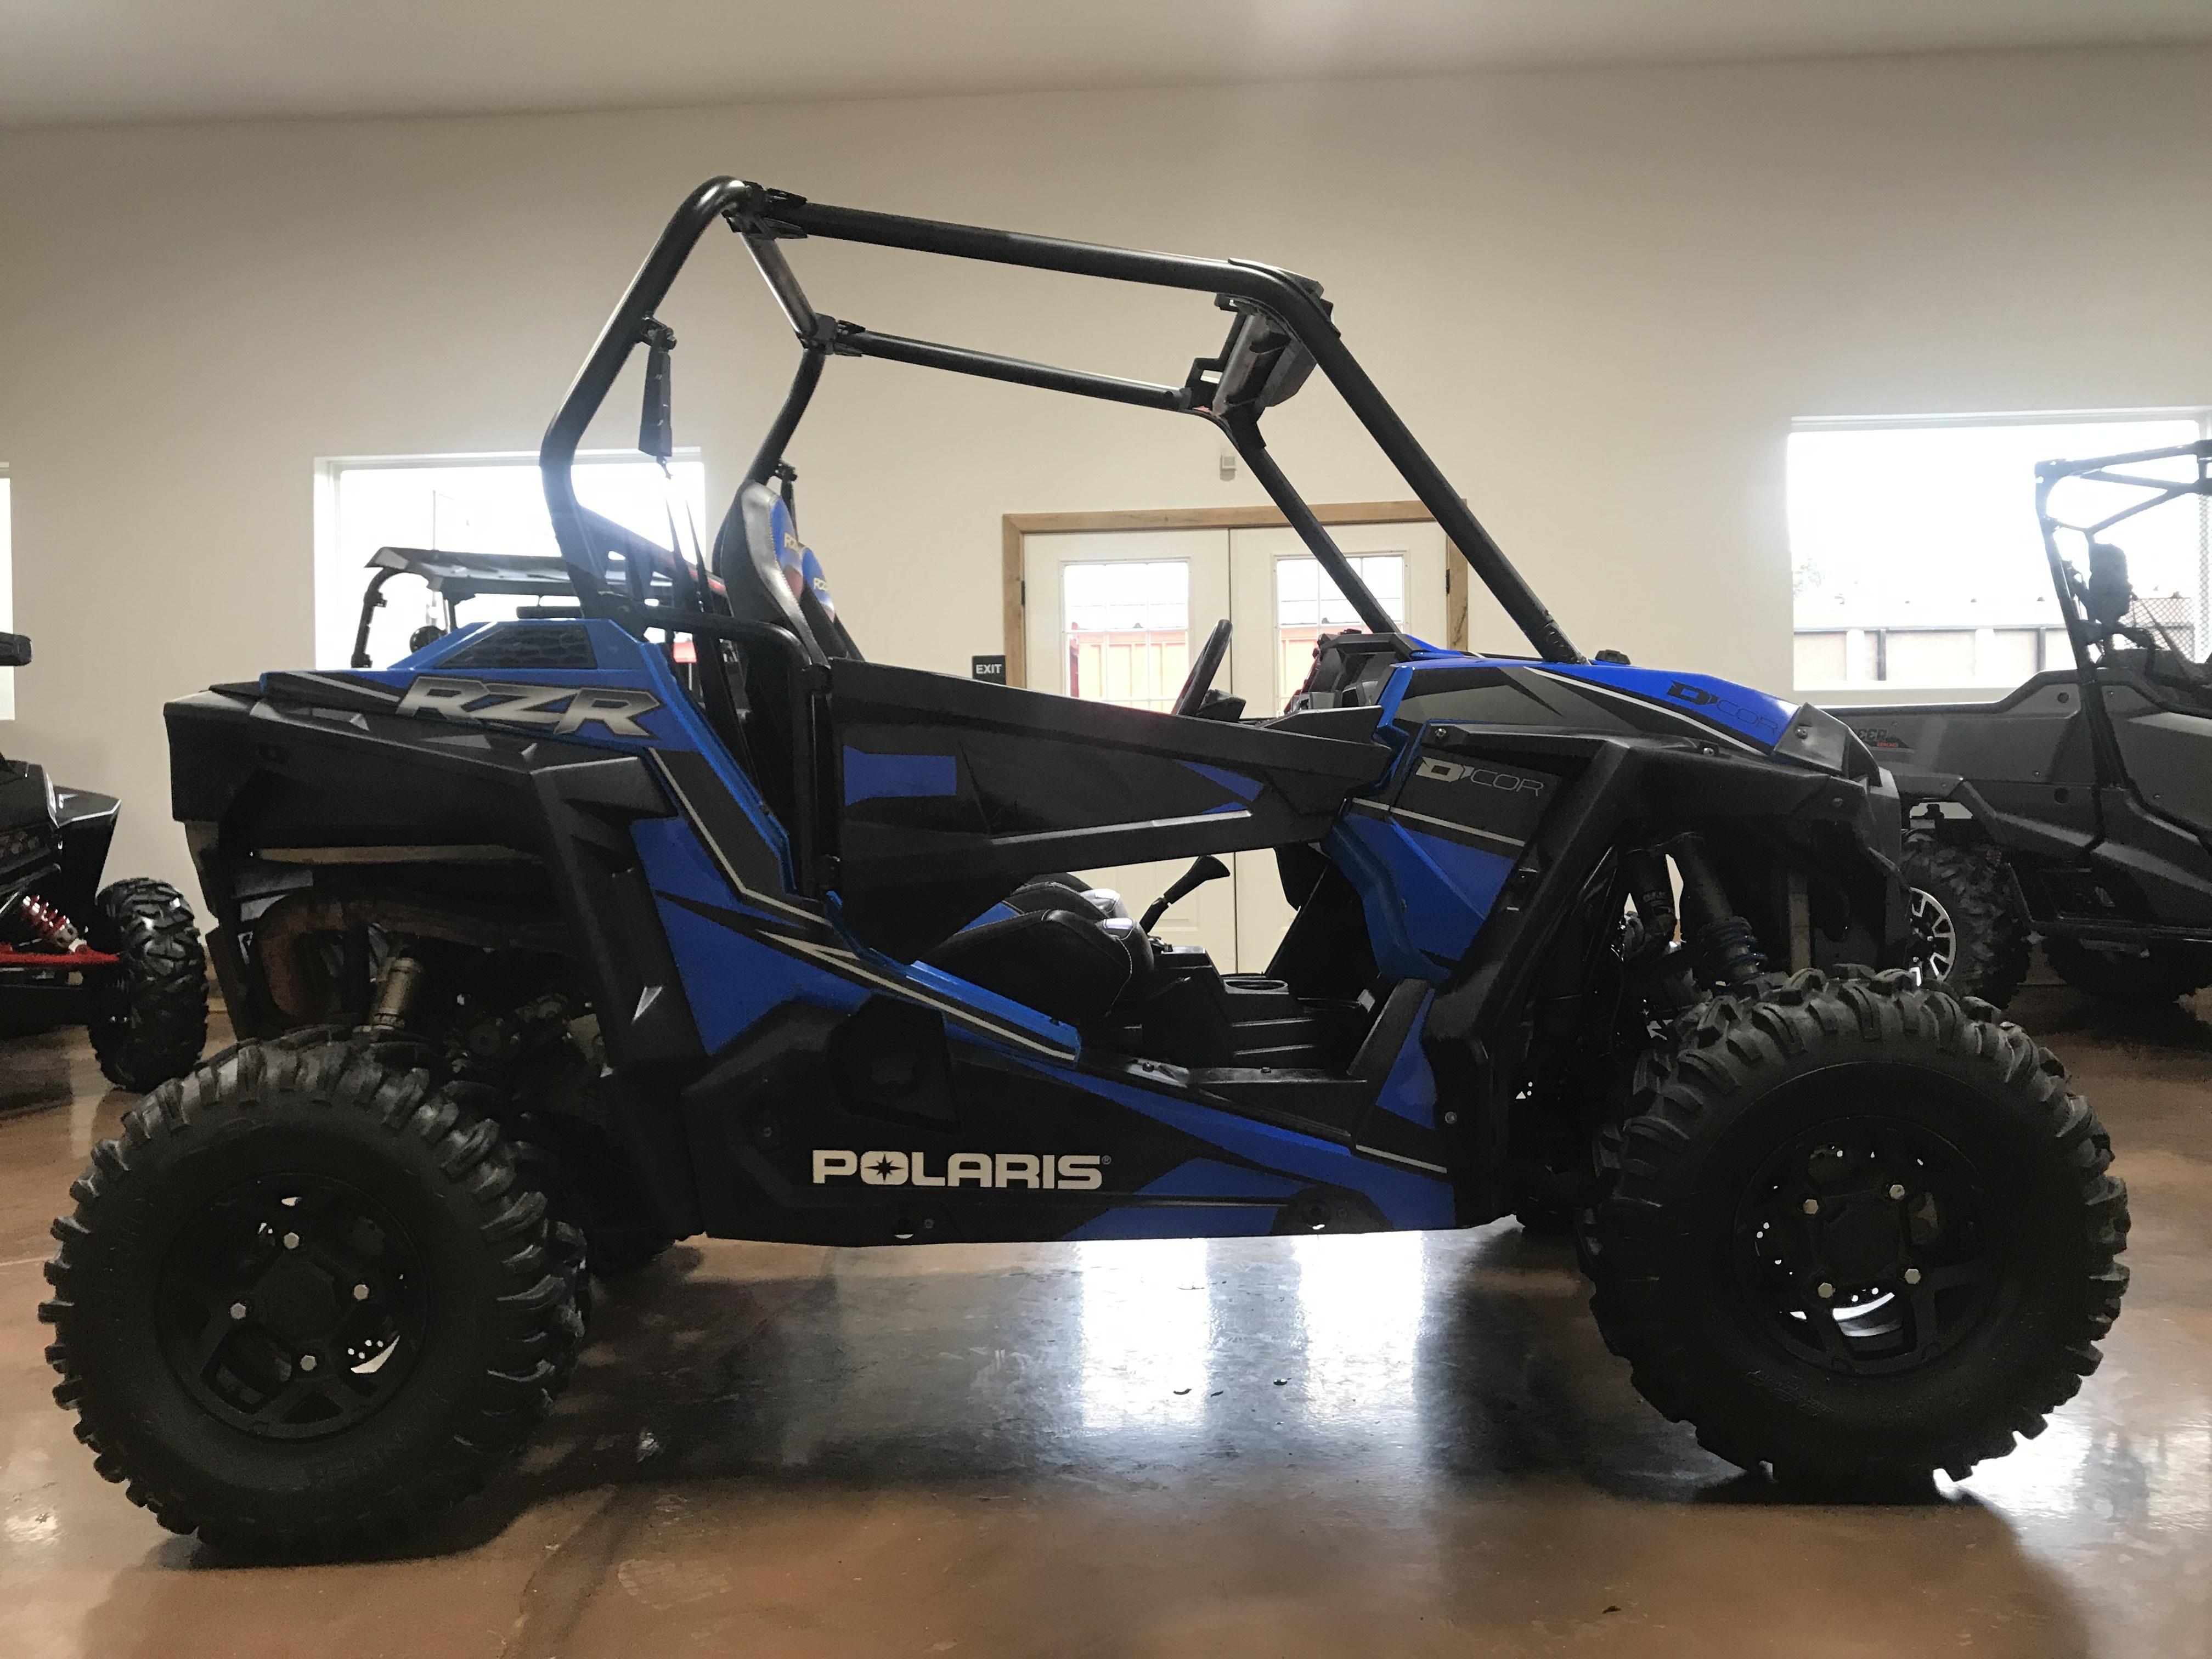 2018 Polaris RZR-S 900